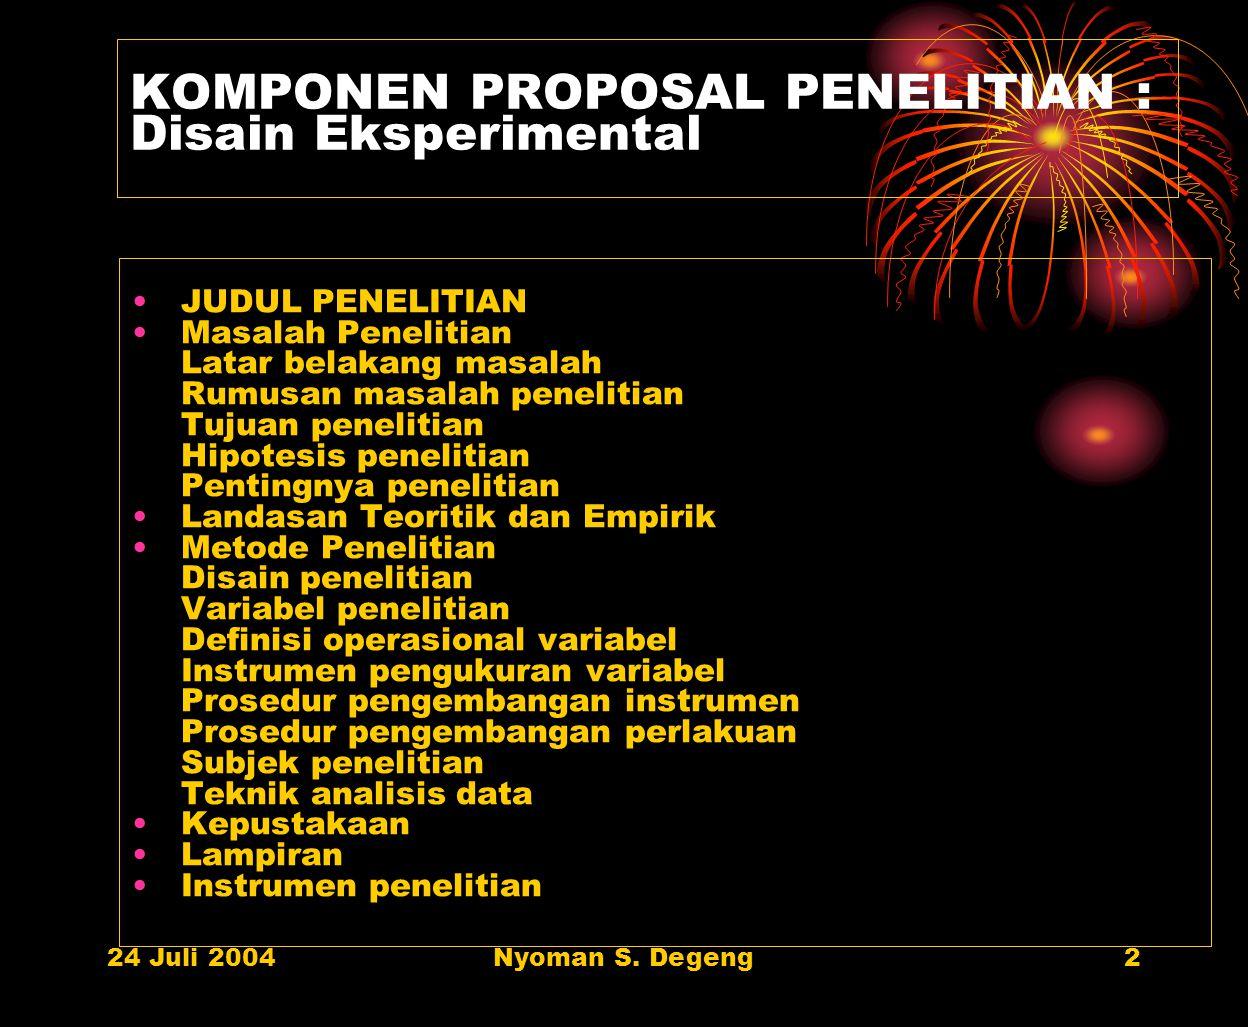 KOMPONEN PROPOSAL PENELITIAN : Disain Eksperimental